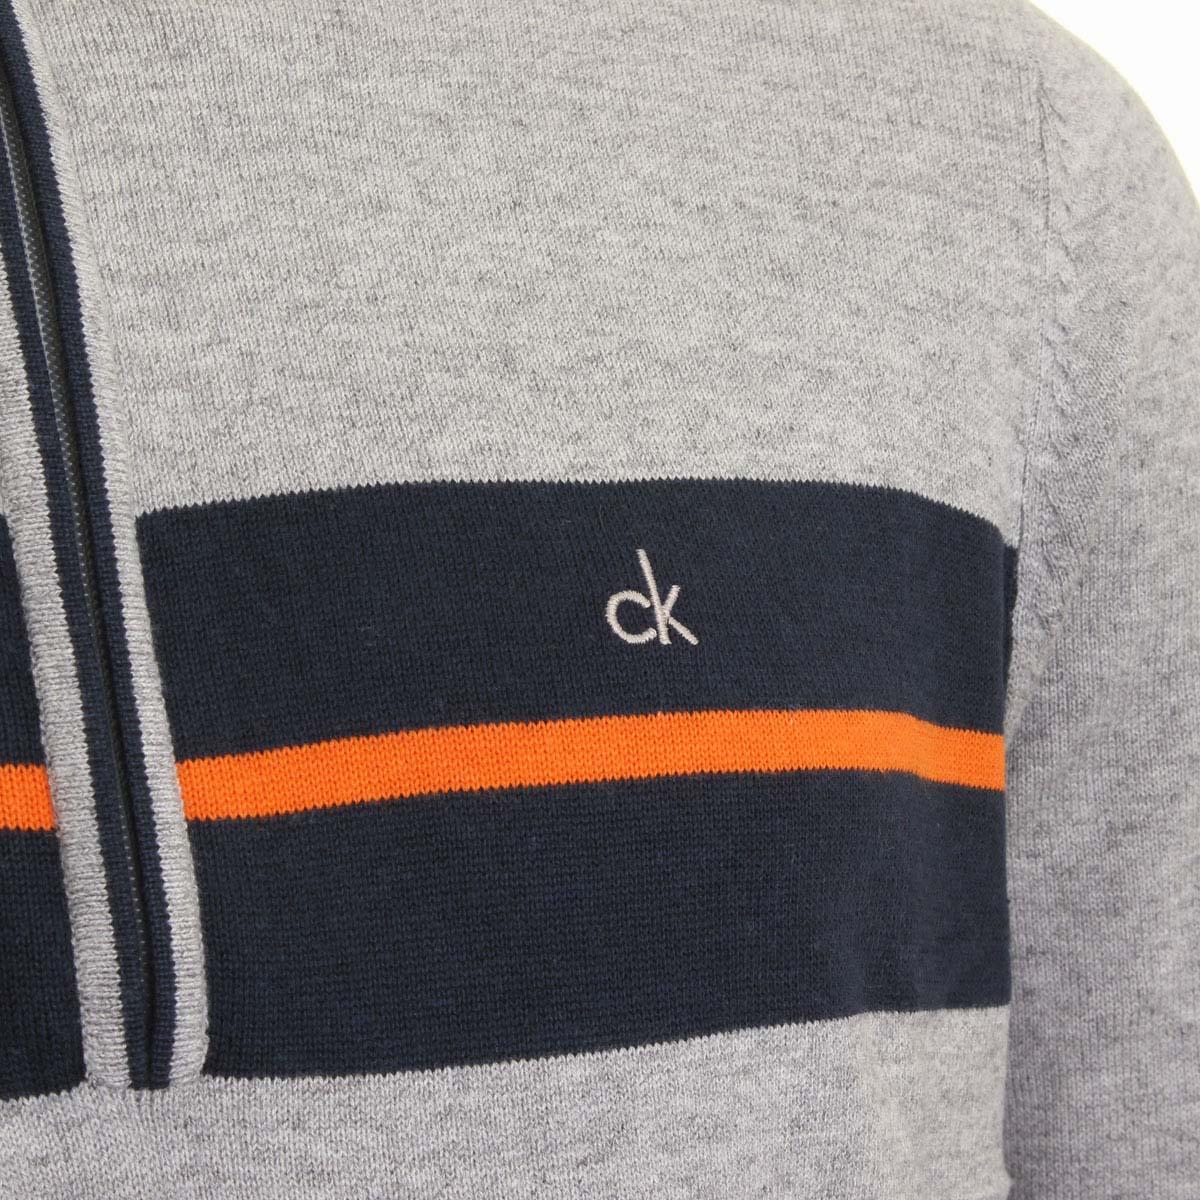 Calvin-Klein-Golf-Mens-CK-Vertex-Half-Zip-Neck-Sweater-Pullover-33-OFF-RRP thumbnail 8